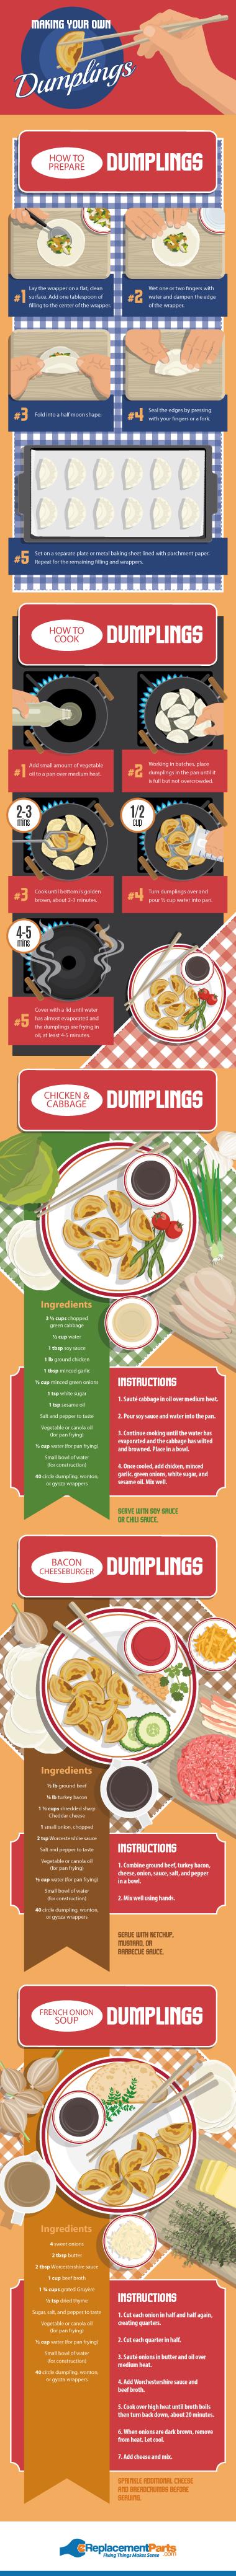 Dumplings Embed Small - Making Your Own Dumplings